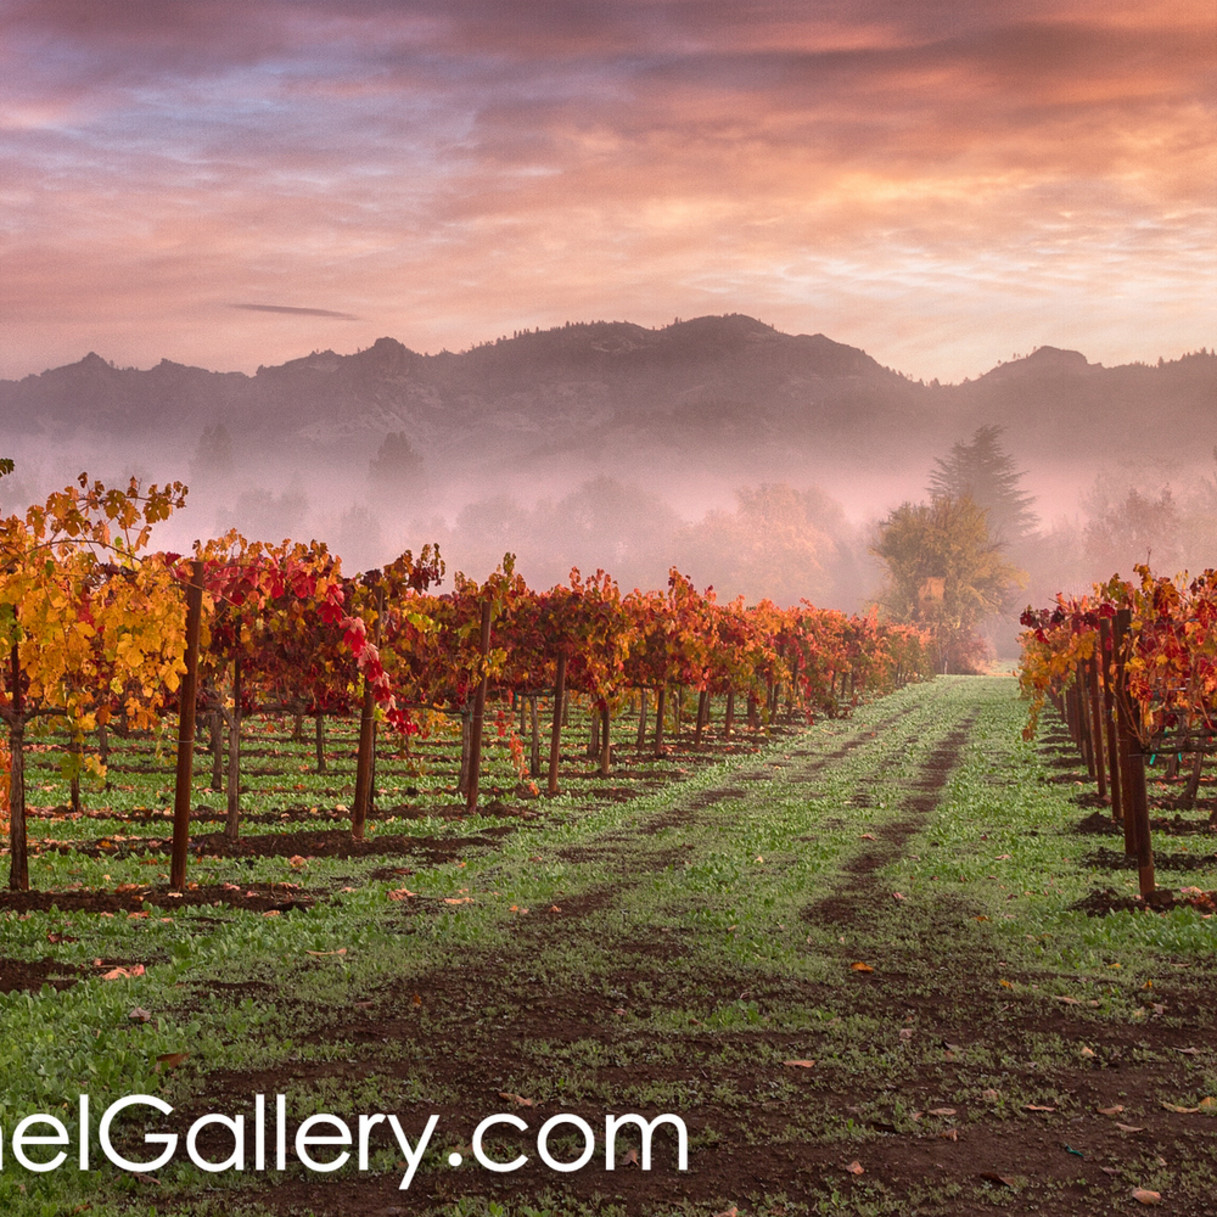 Autumn sunrise calistoga rkhowf